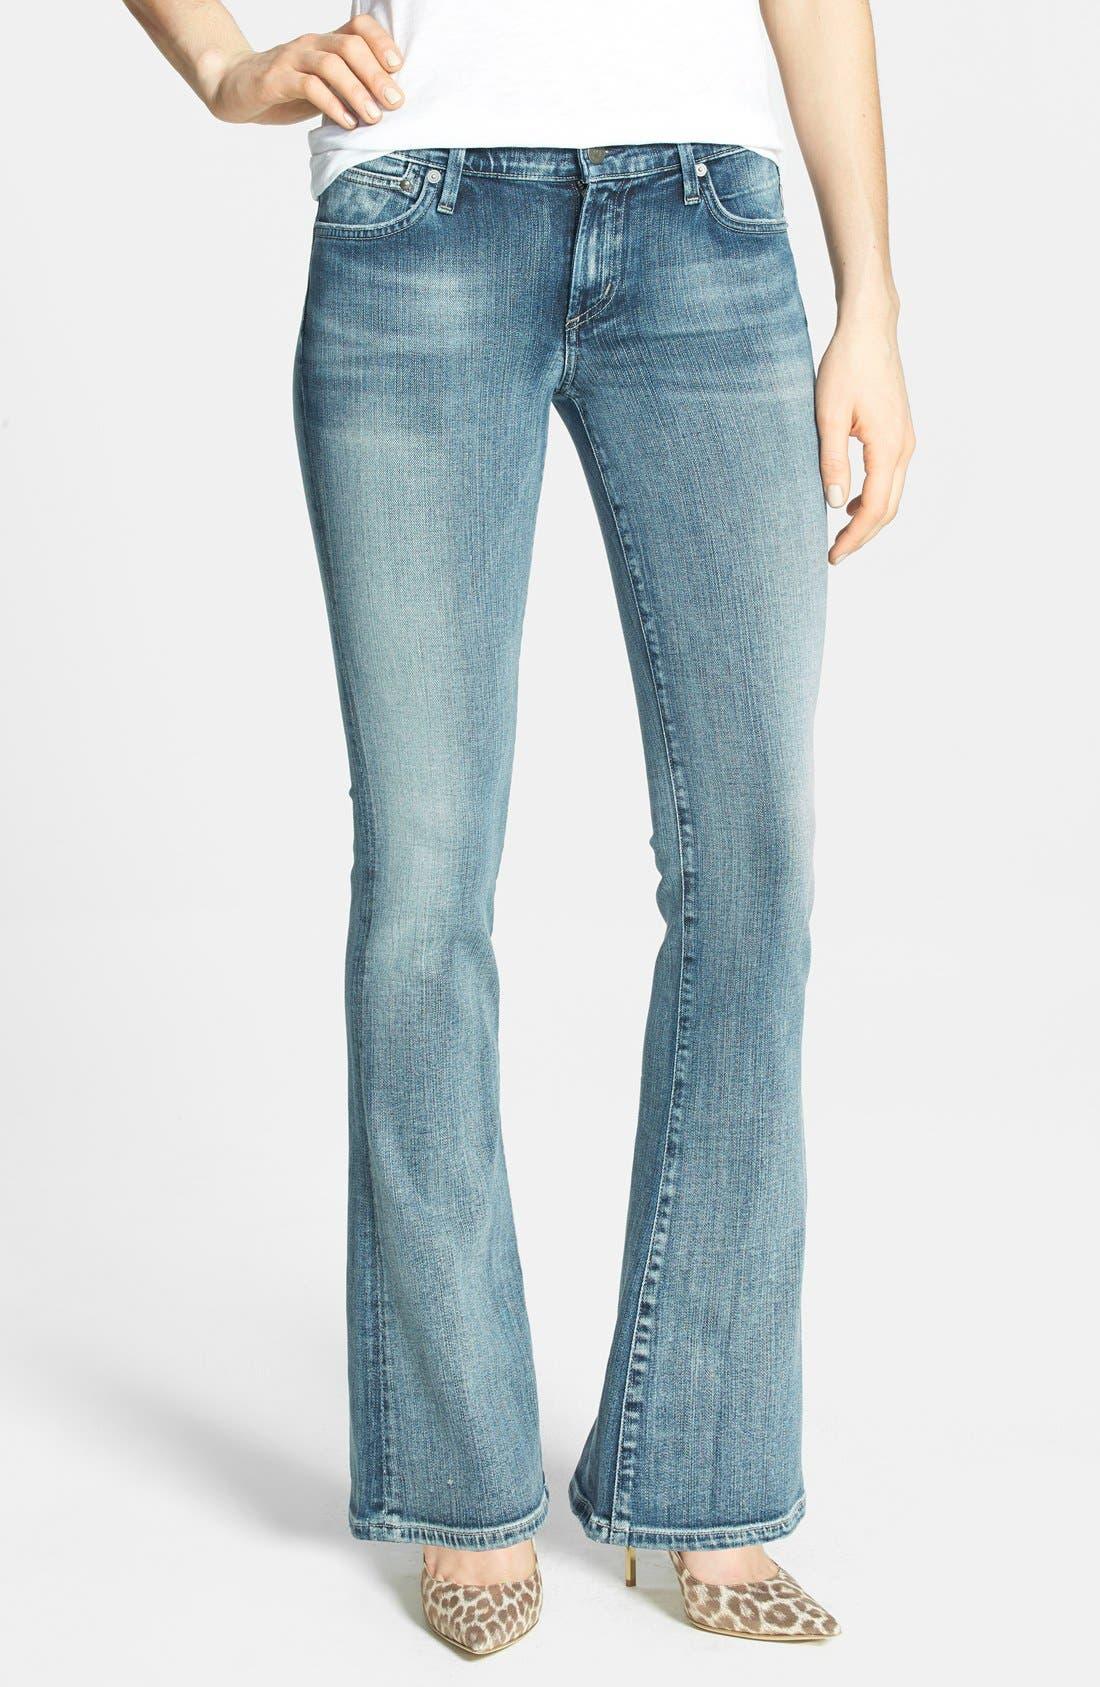 Main Image - Citizens of Humanity 'Emannuelle' Slim Bootcut Jeans (Gaze) (Petite)